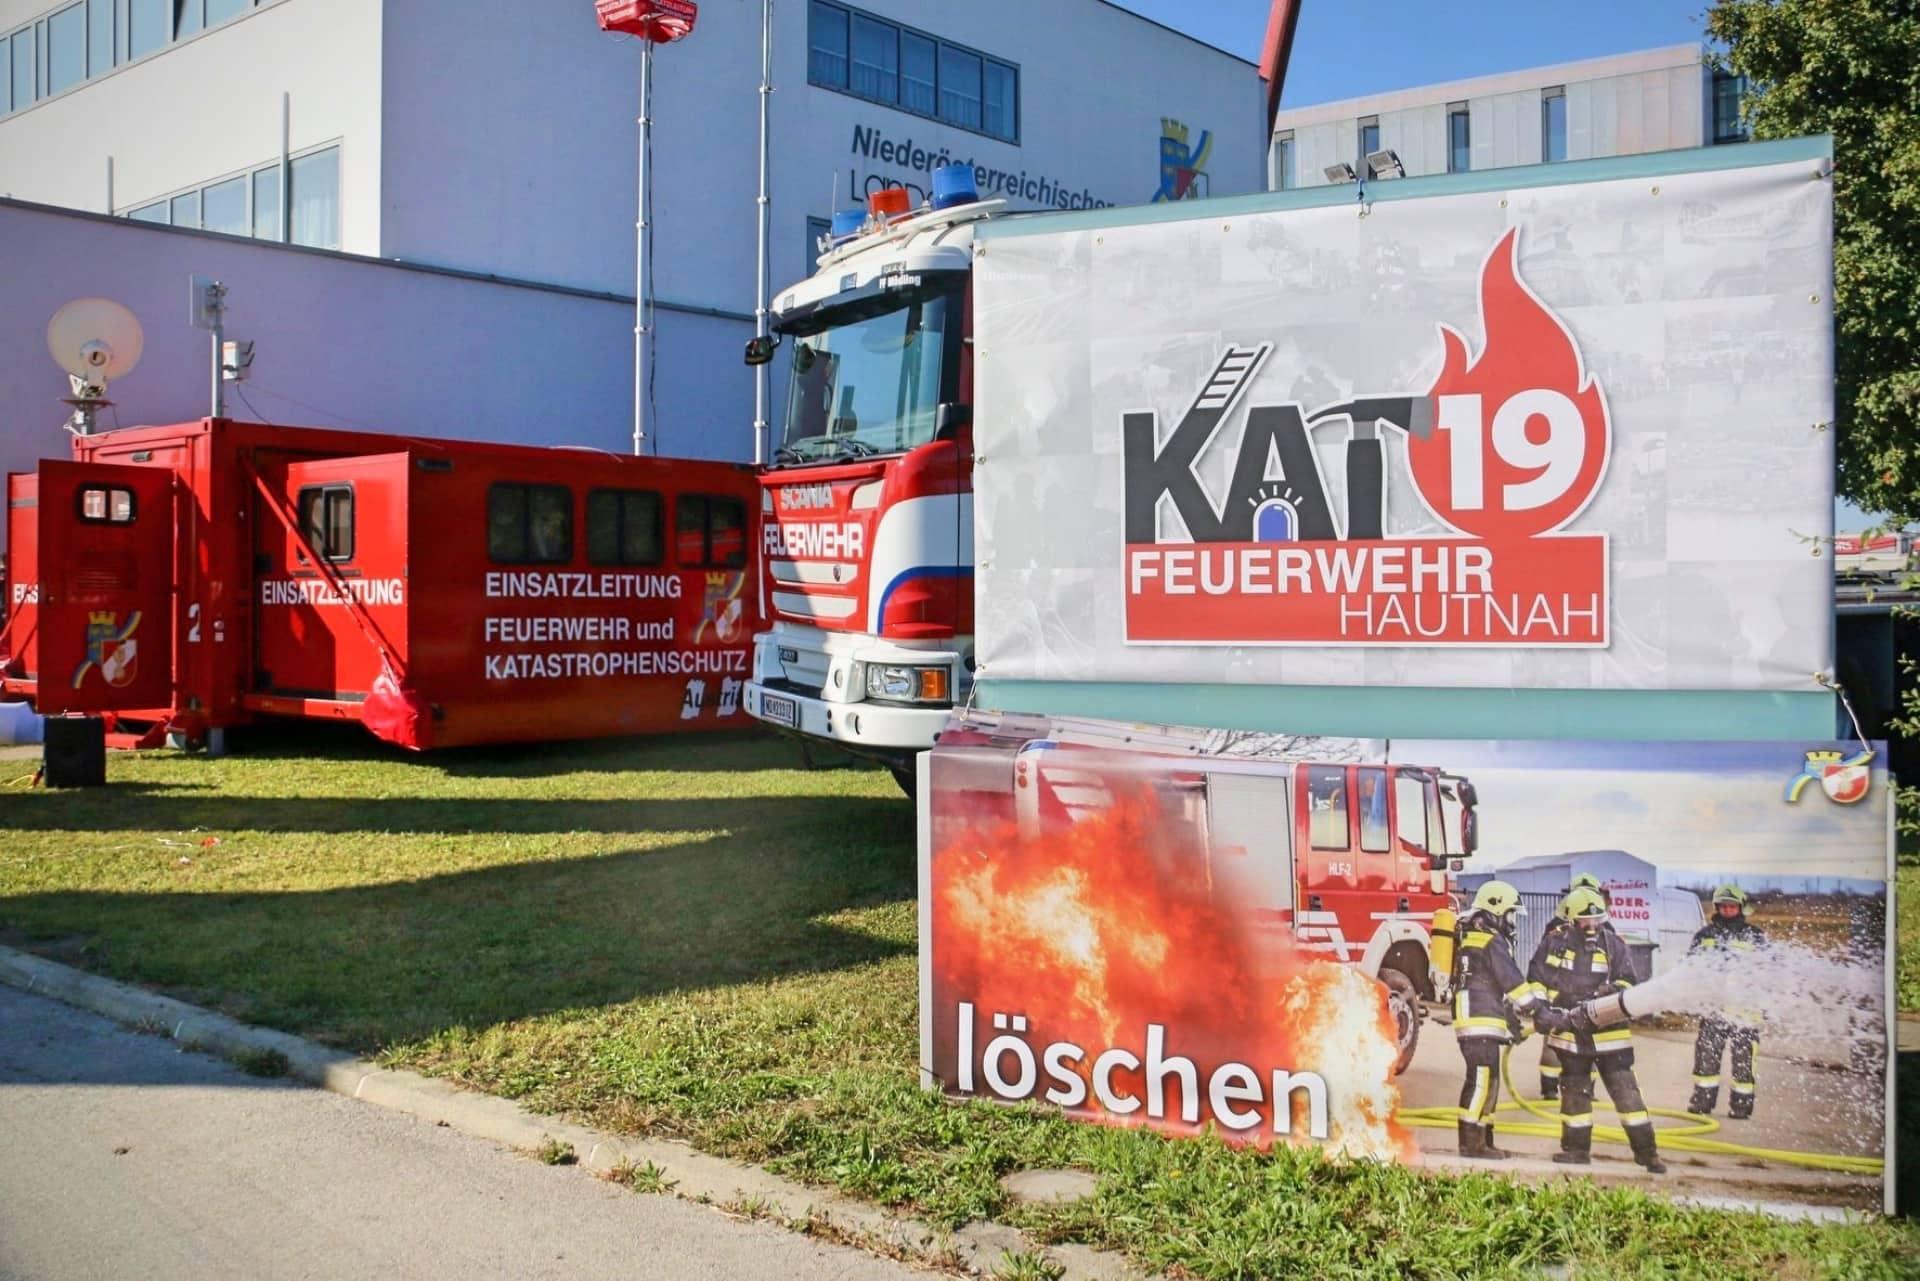 KAT19 - Feuerwehr hautnah